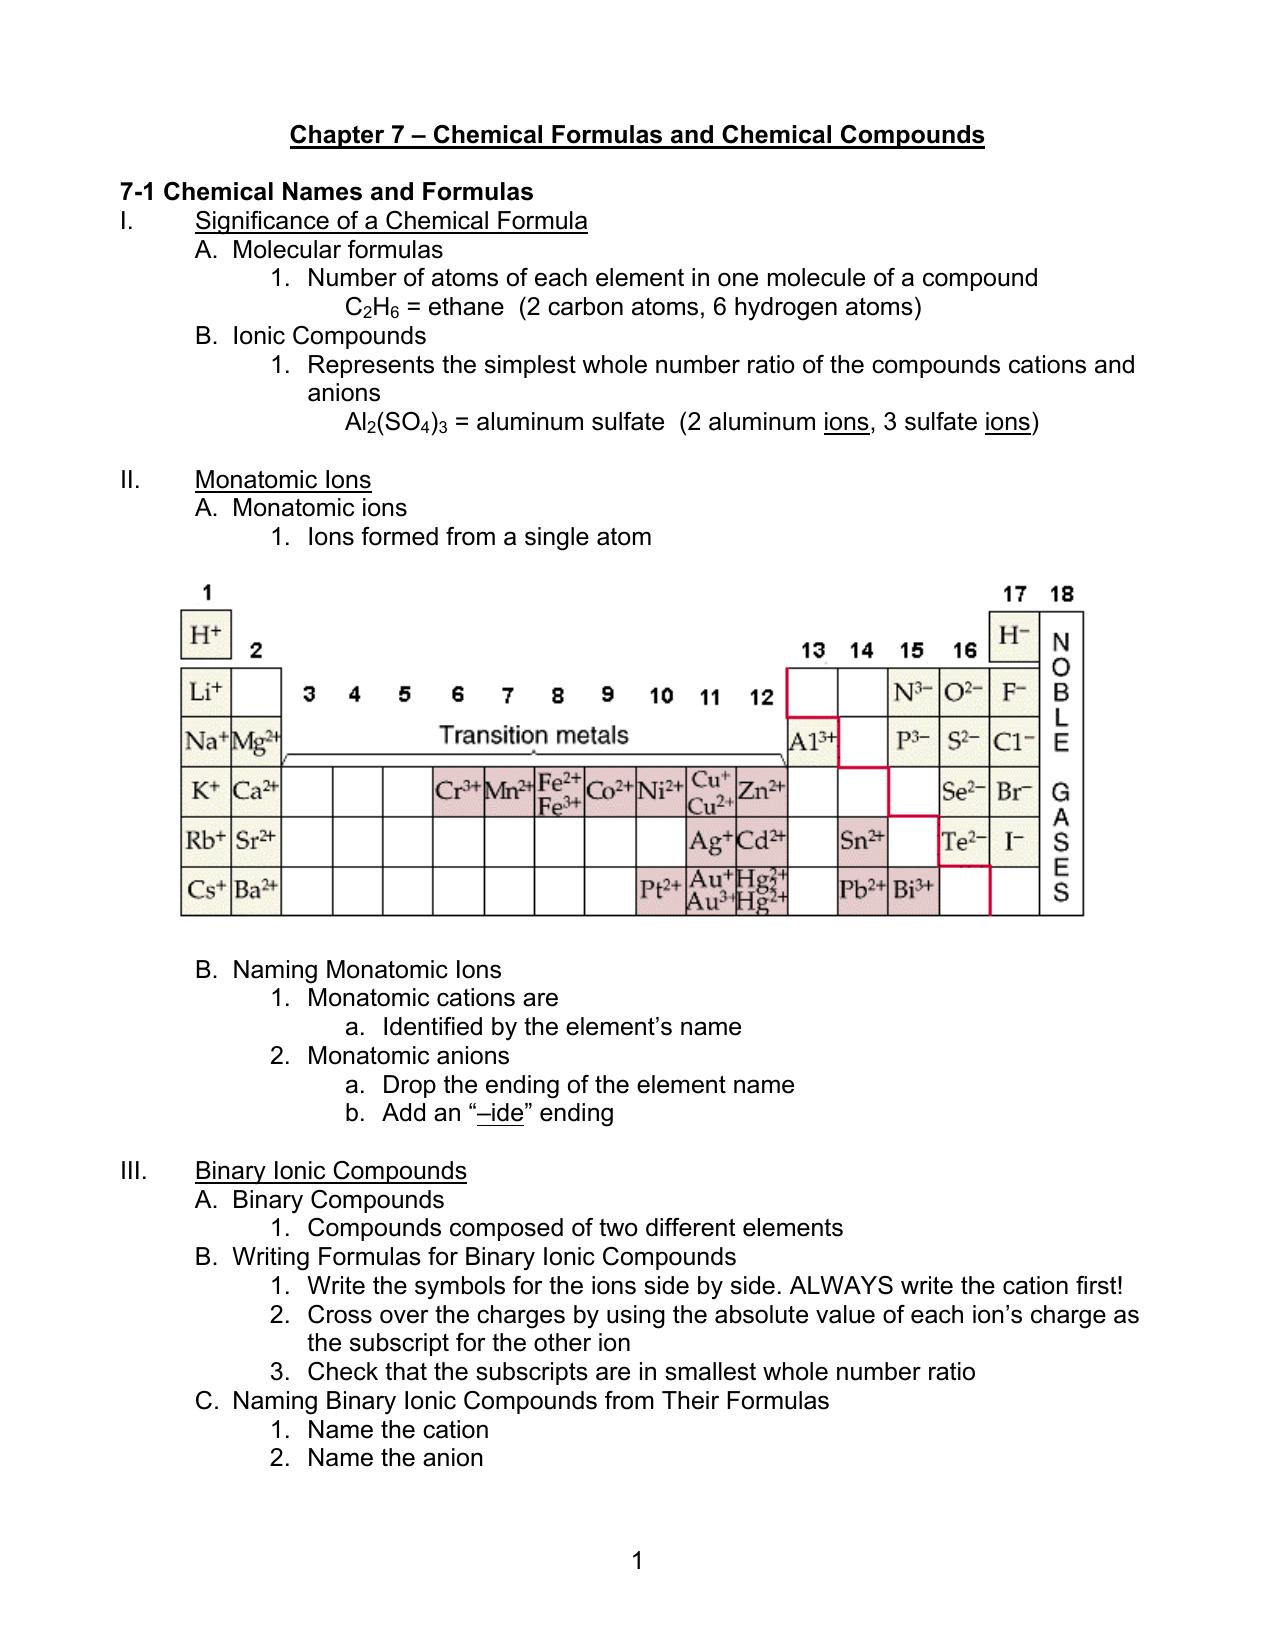 Nomenclature Worksheet 1 Monatomic Ions   Worksheet List